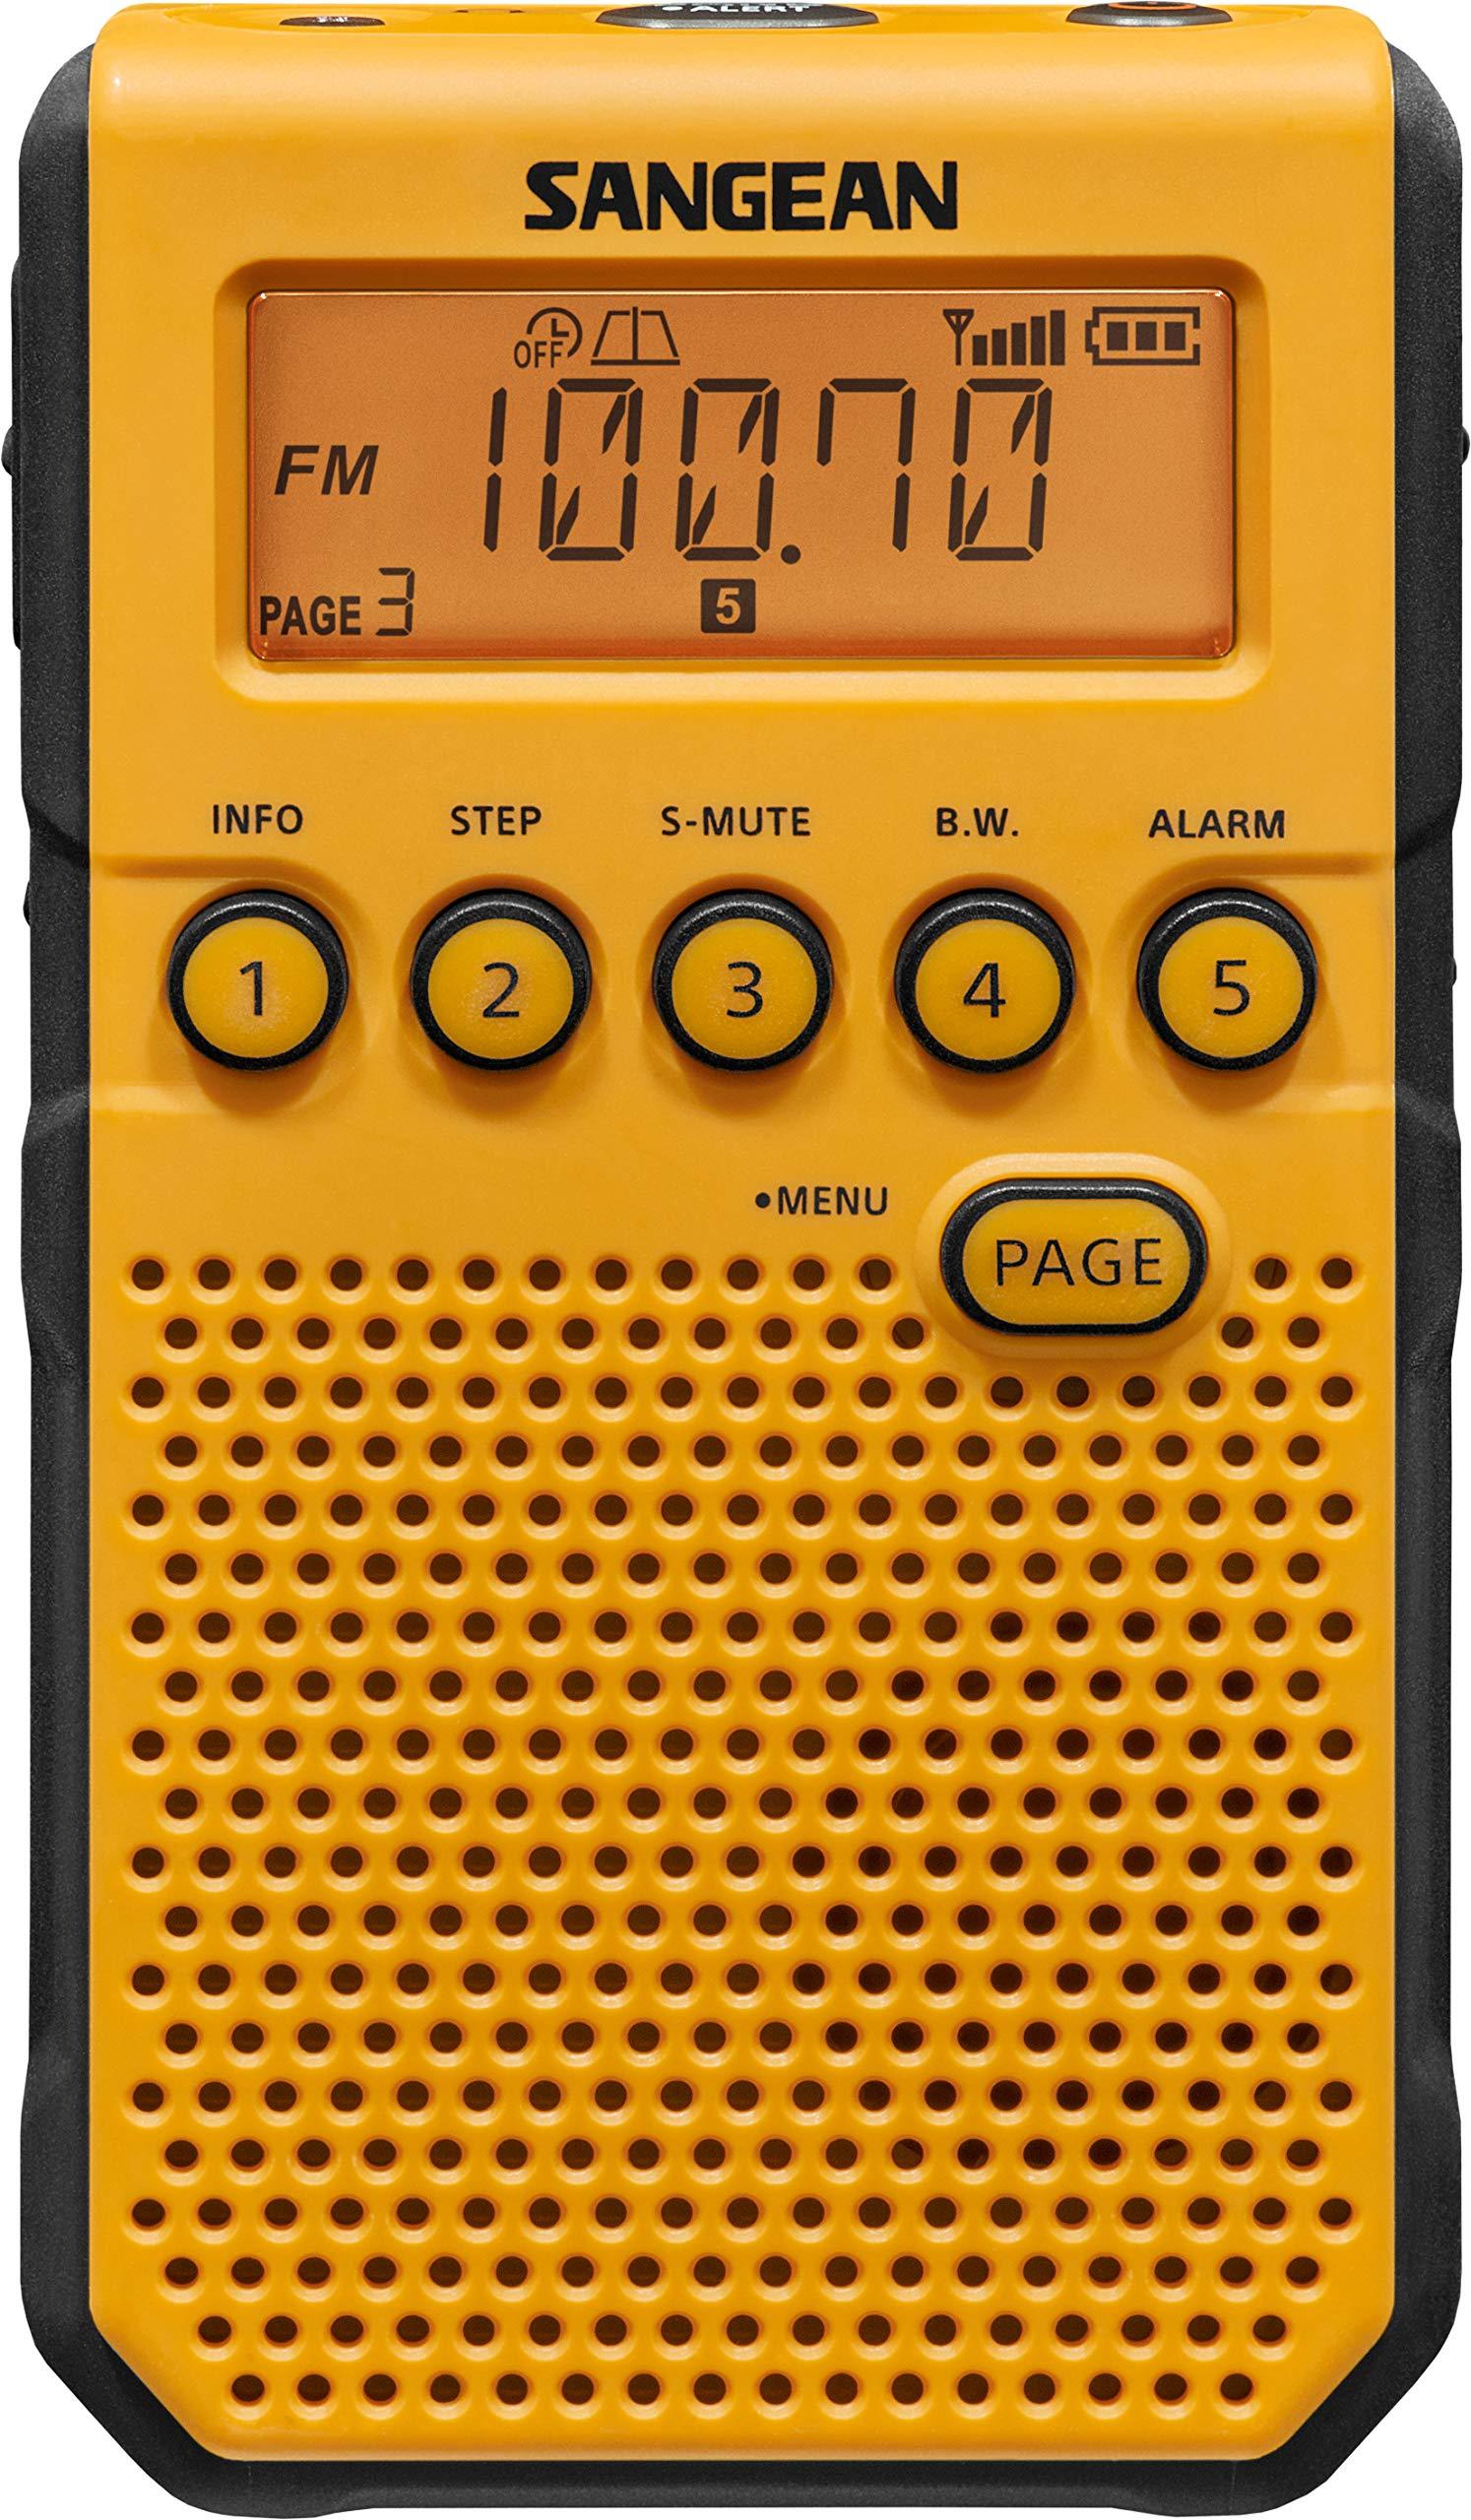 Sangean DT-800YL AM / FM / NOAA Weather Alert Rechargeable Pocket Radio (Yellow) by Saugeen America, Inc. (Image #1)